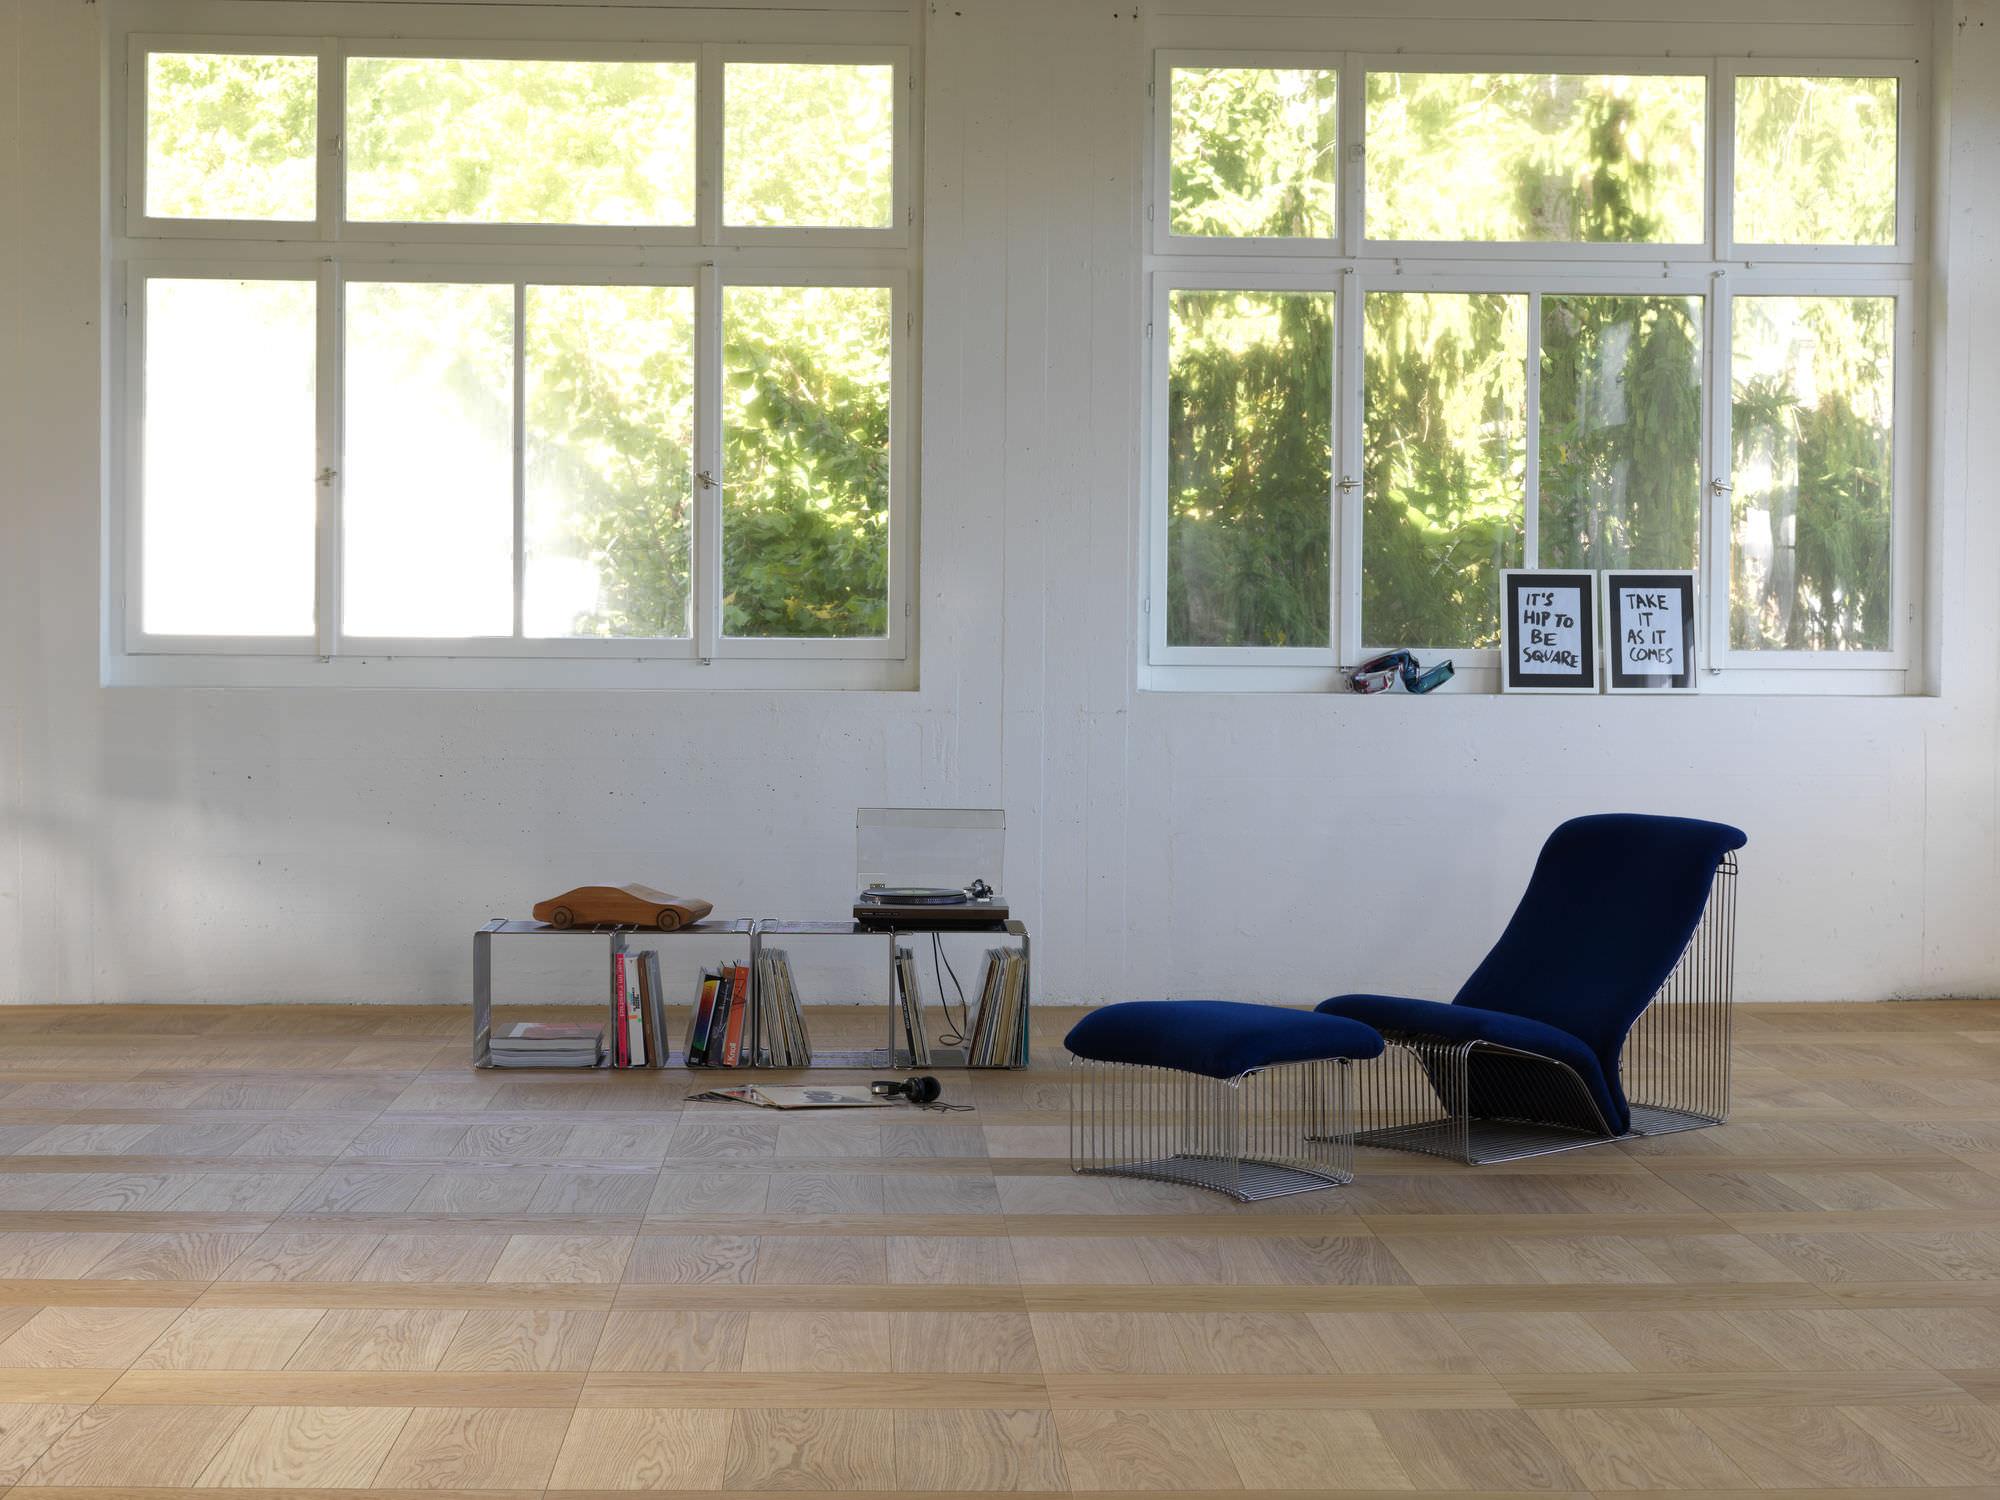 bodenbel ge raumausstattung jung in ludwigsburg. Black Bedroom Furniture Sets. Home Design Ideas